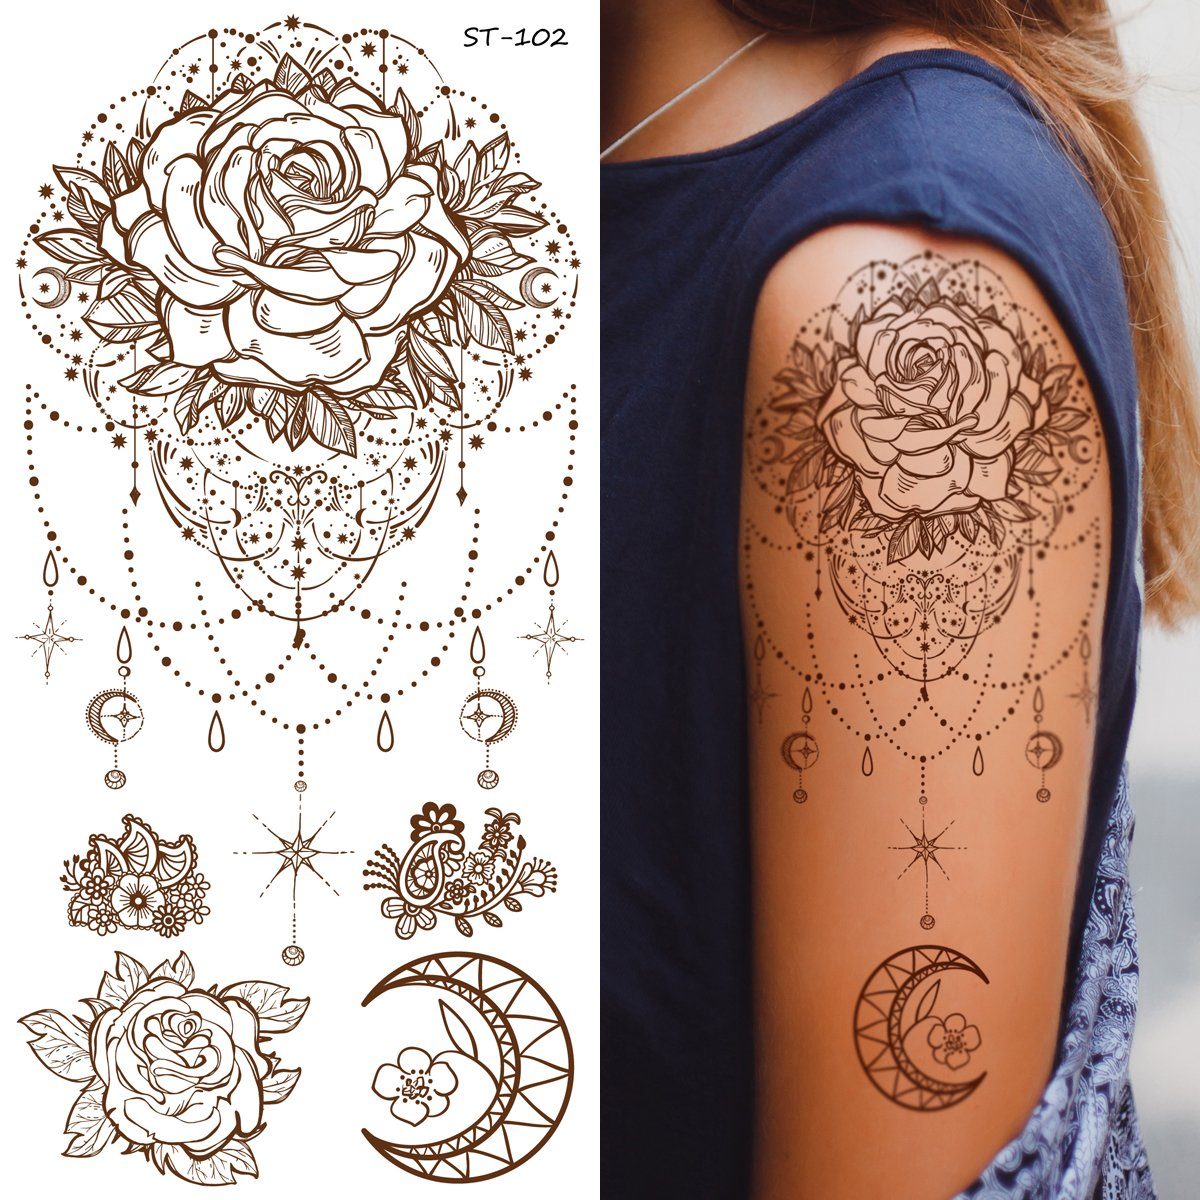 7fc5d1bfbf768 Amazon.com : Supperb Temporary Tattoos - Inspired Mandala Rose Henna  Jewelry Healing Yoga Meditation Tattoo : Beauty